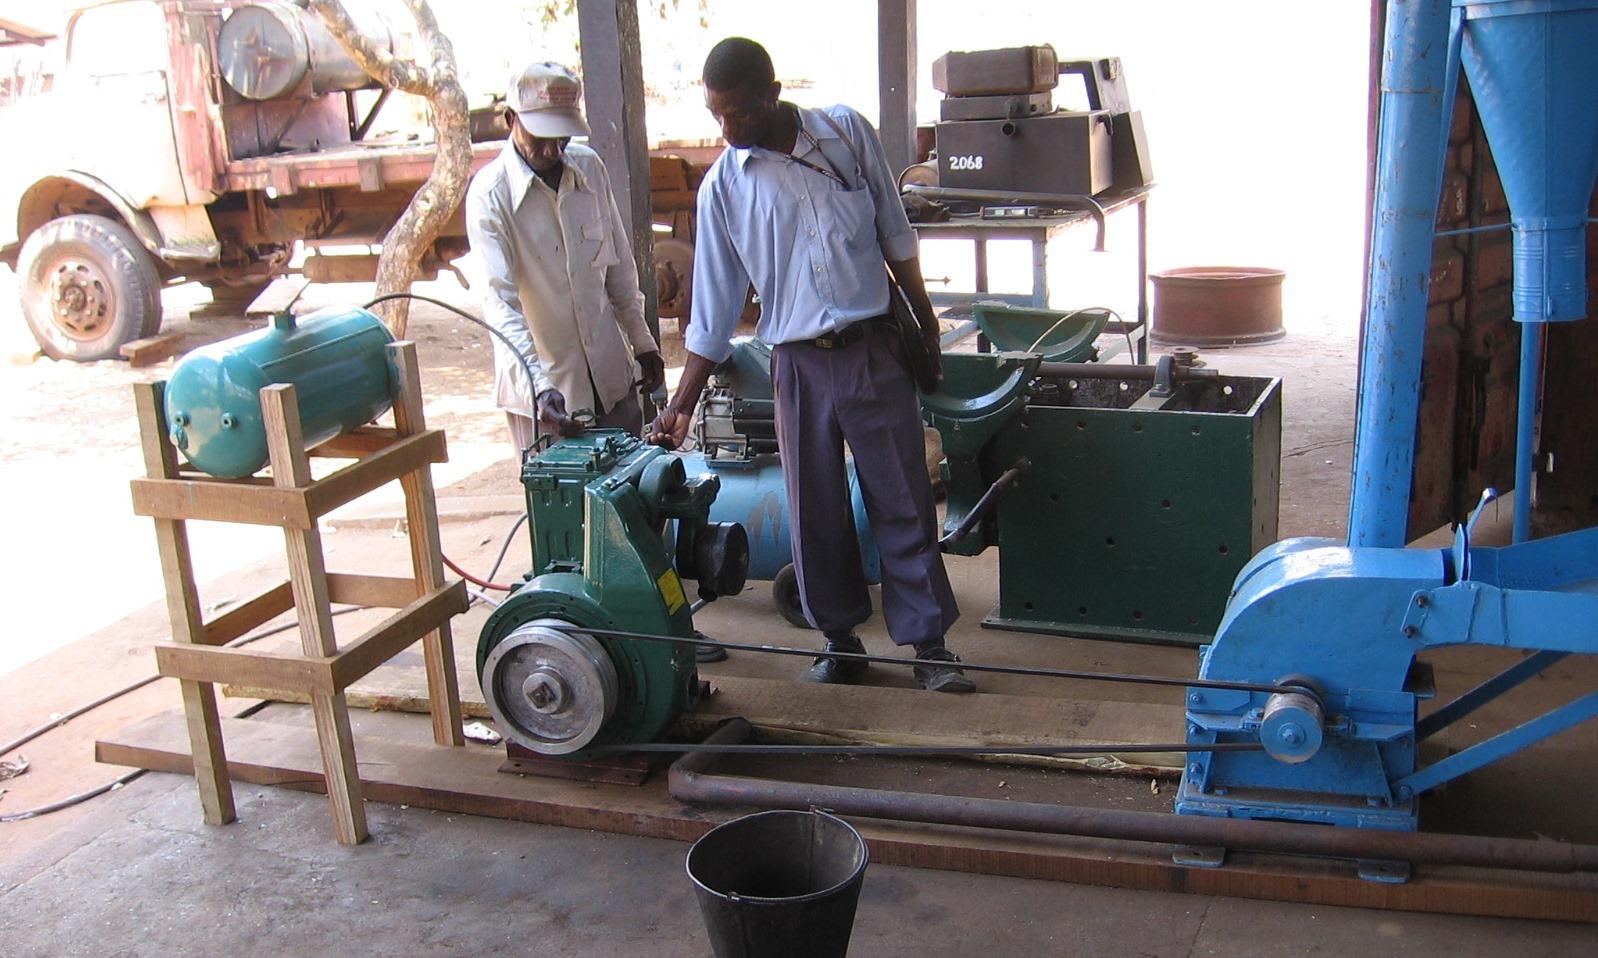 O Segundo moinho  - Second grinding mill